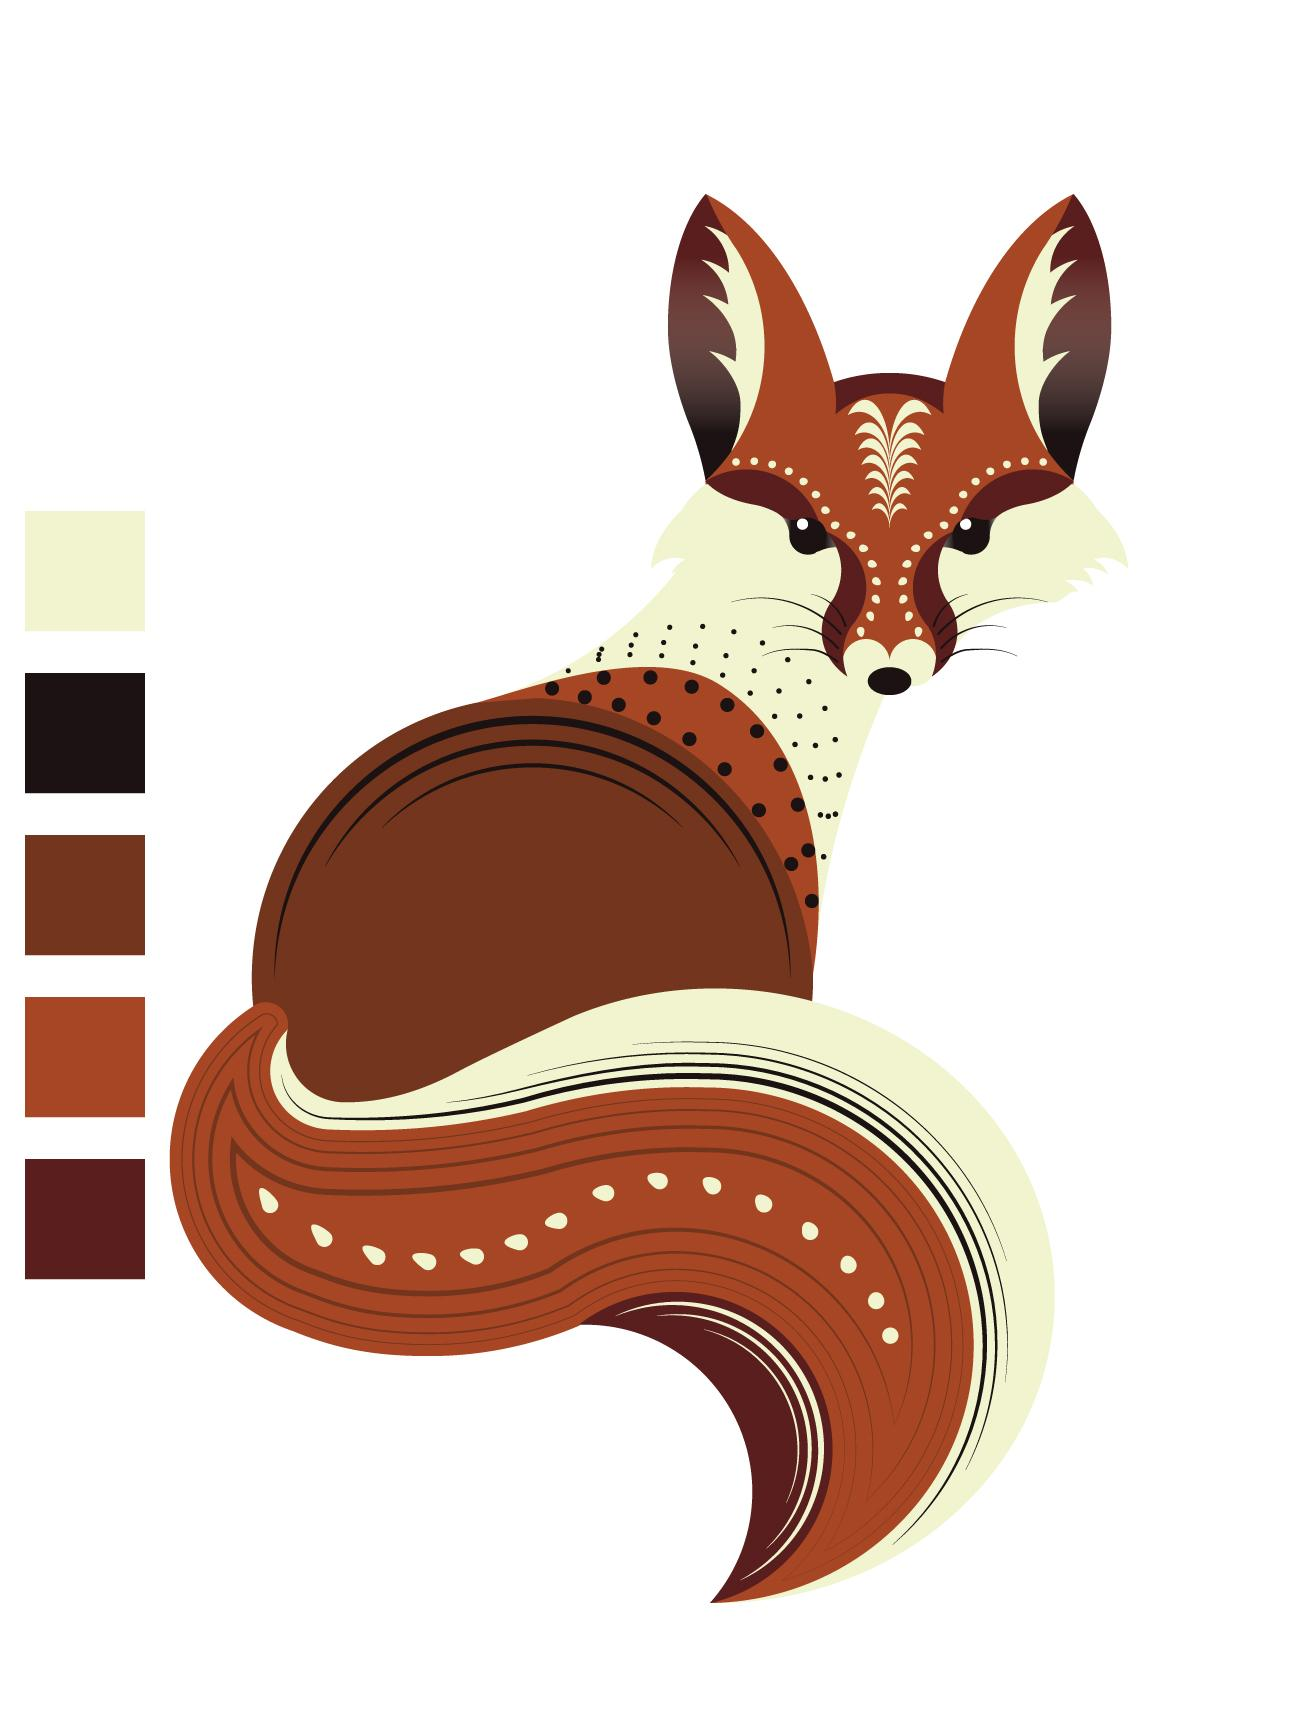 Light Fox - image 3 - student project